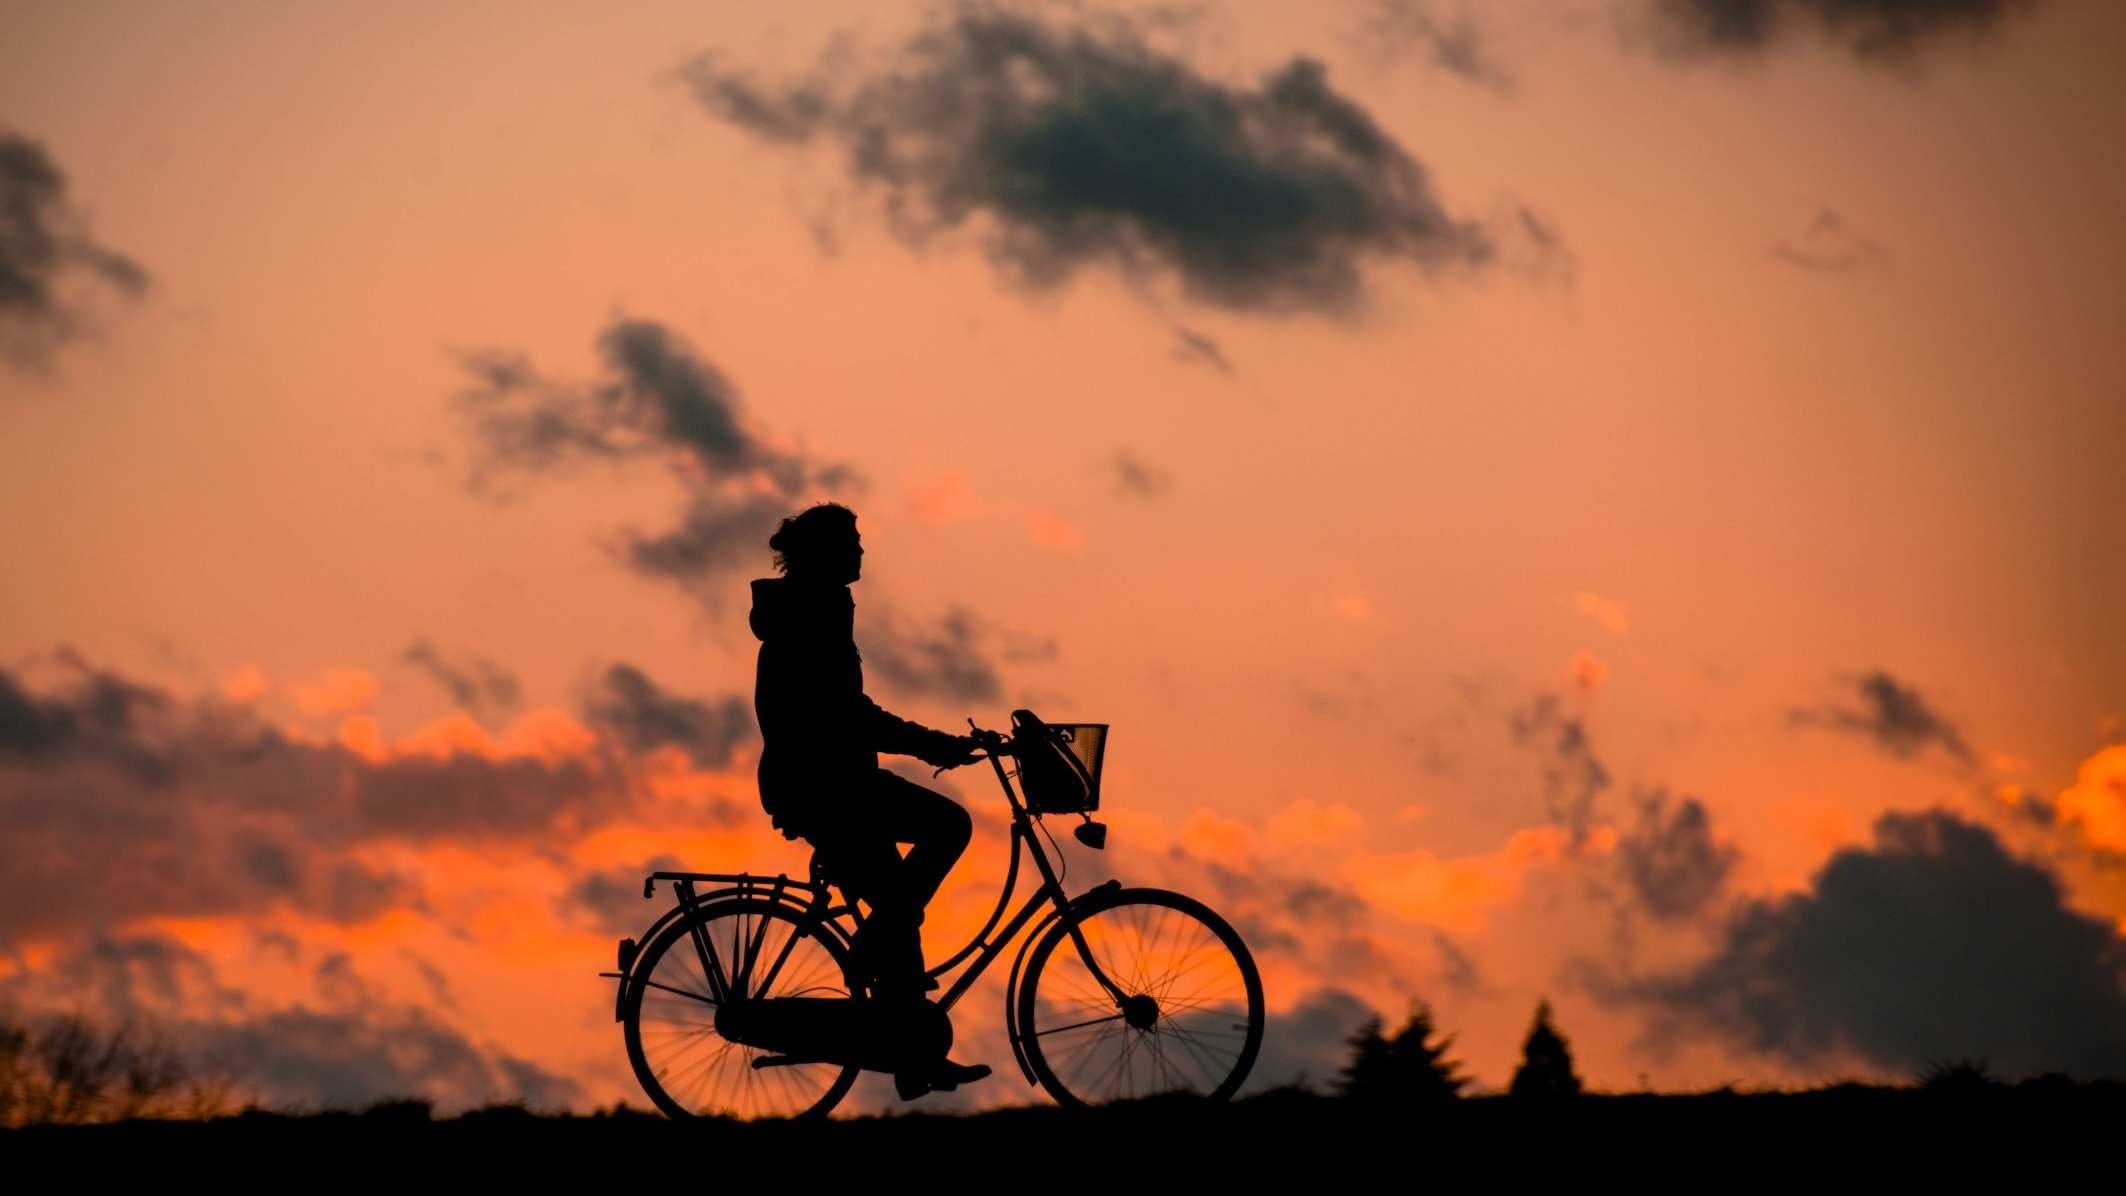 Kostenloses Stock Foto zu dämmerung, radfahrer, sonnenaufgang, sonnenuntergang